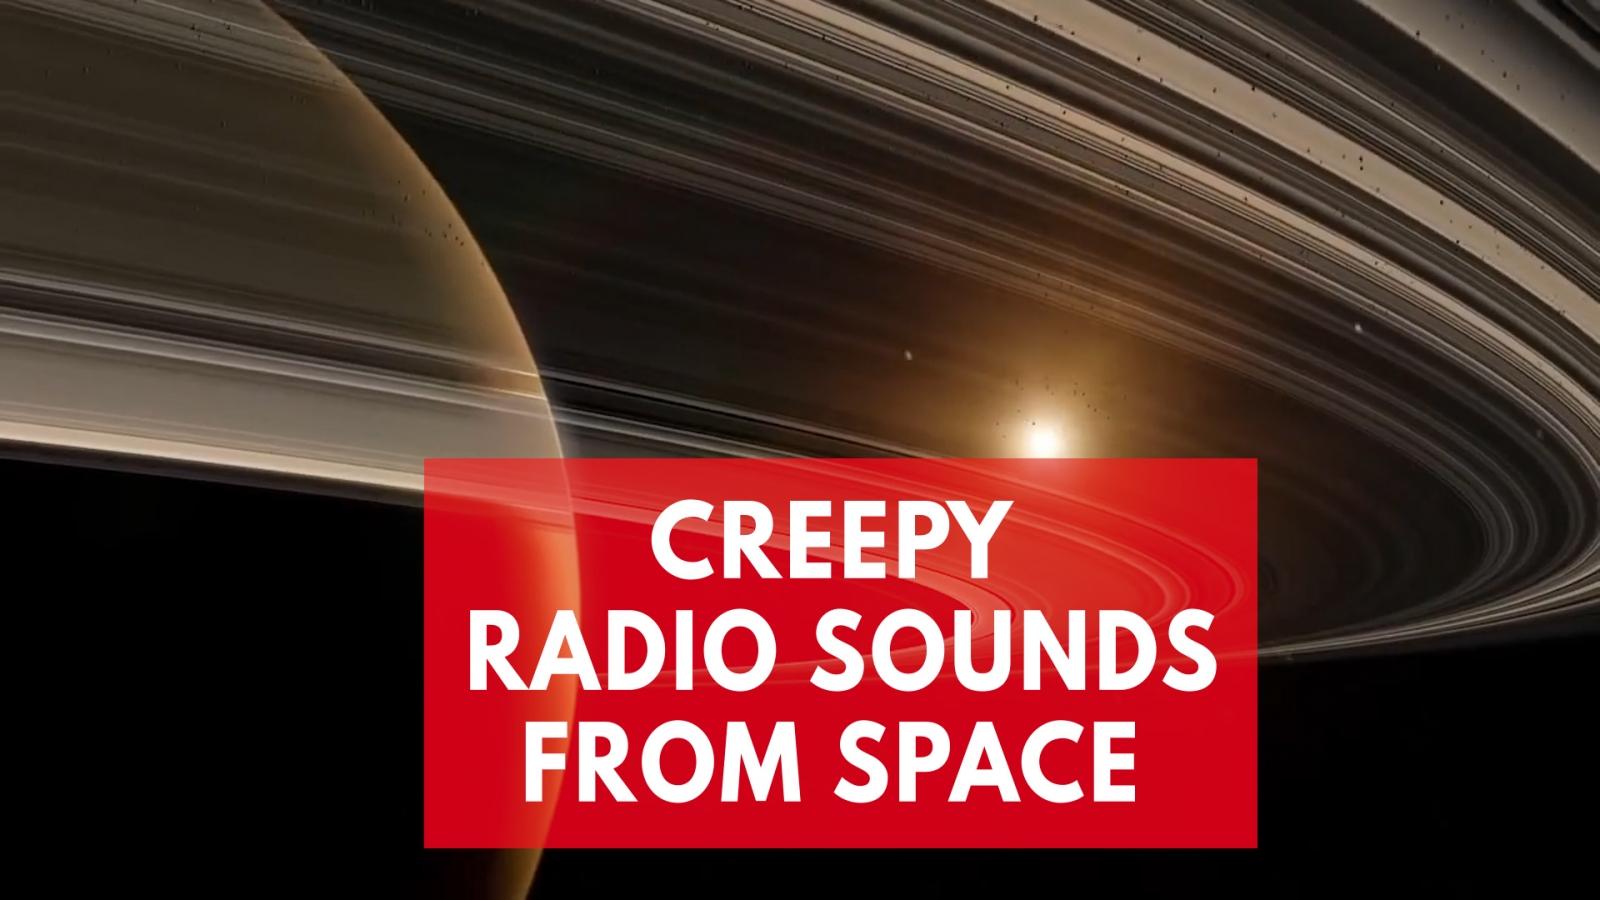 nasa space recordings sound - photo #42